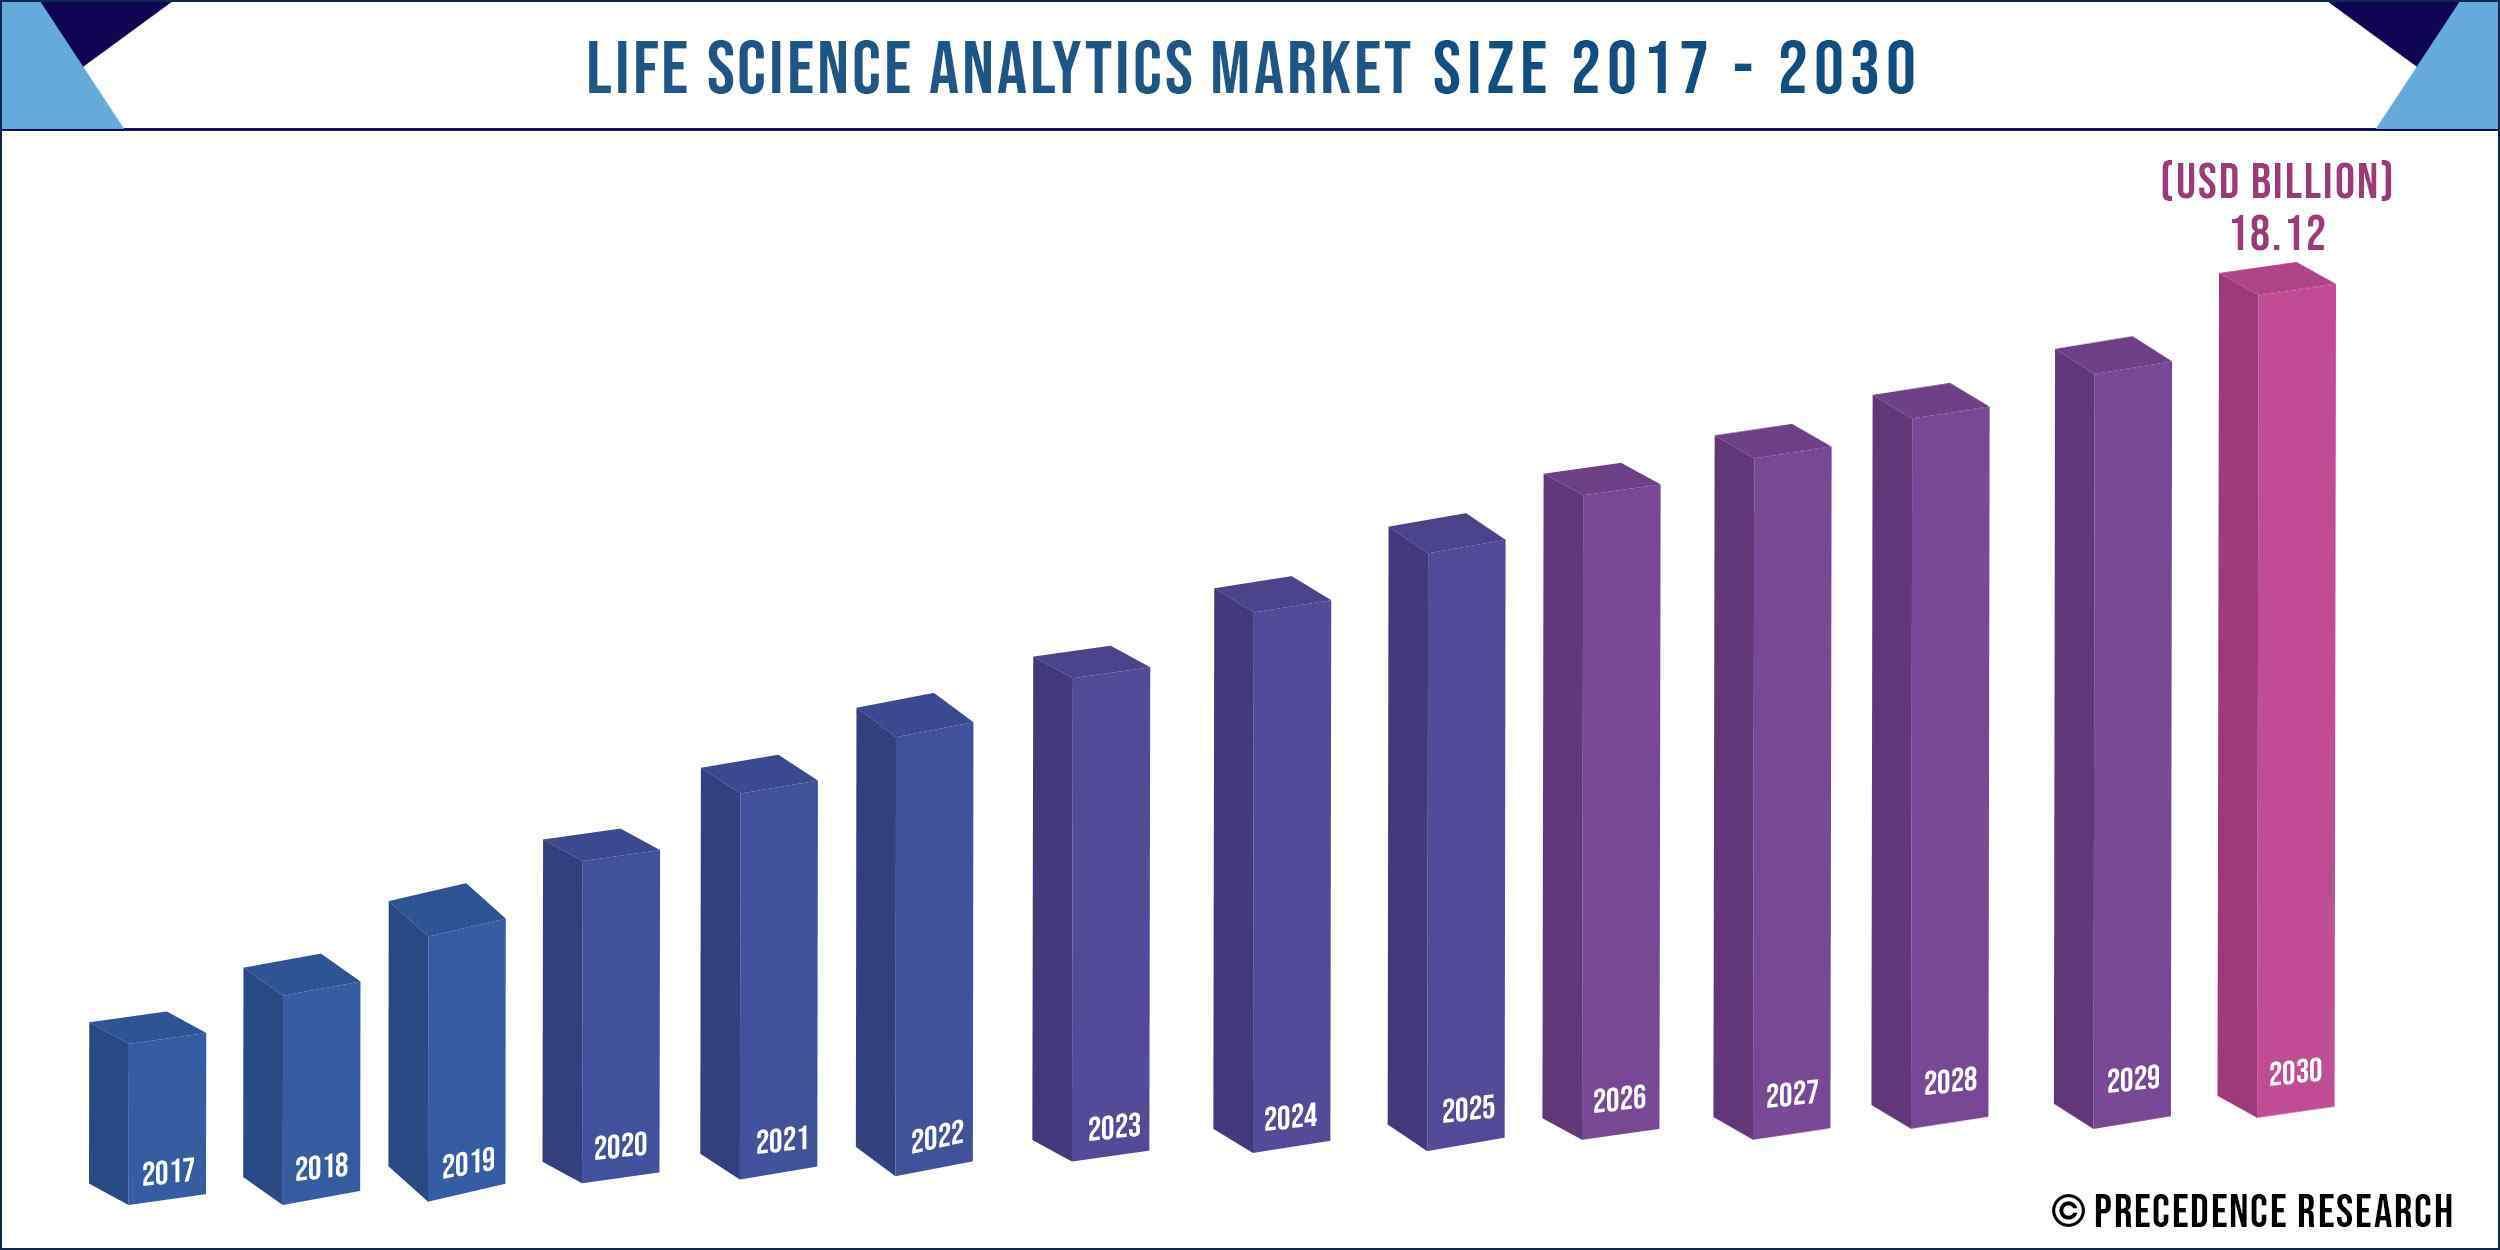 Life Science Analytics Market Size 2017 to 2030